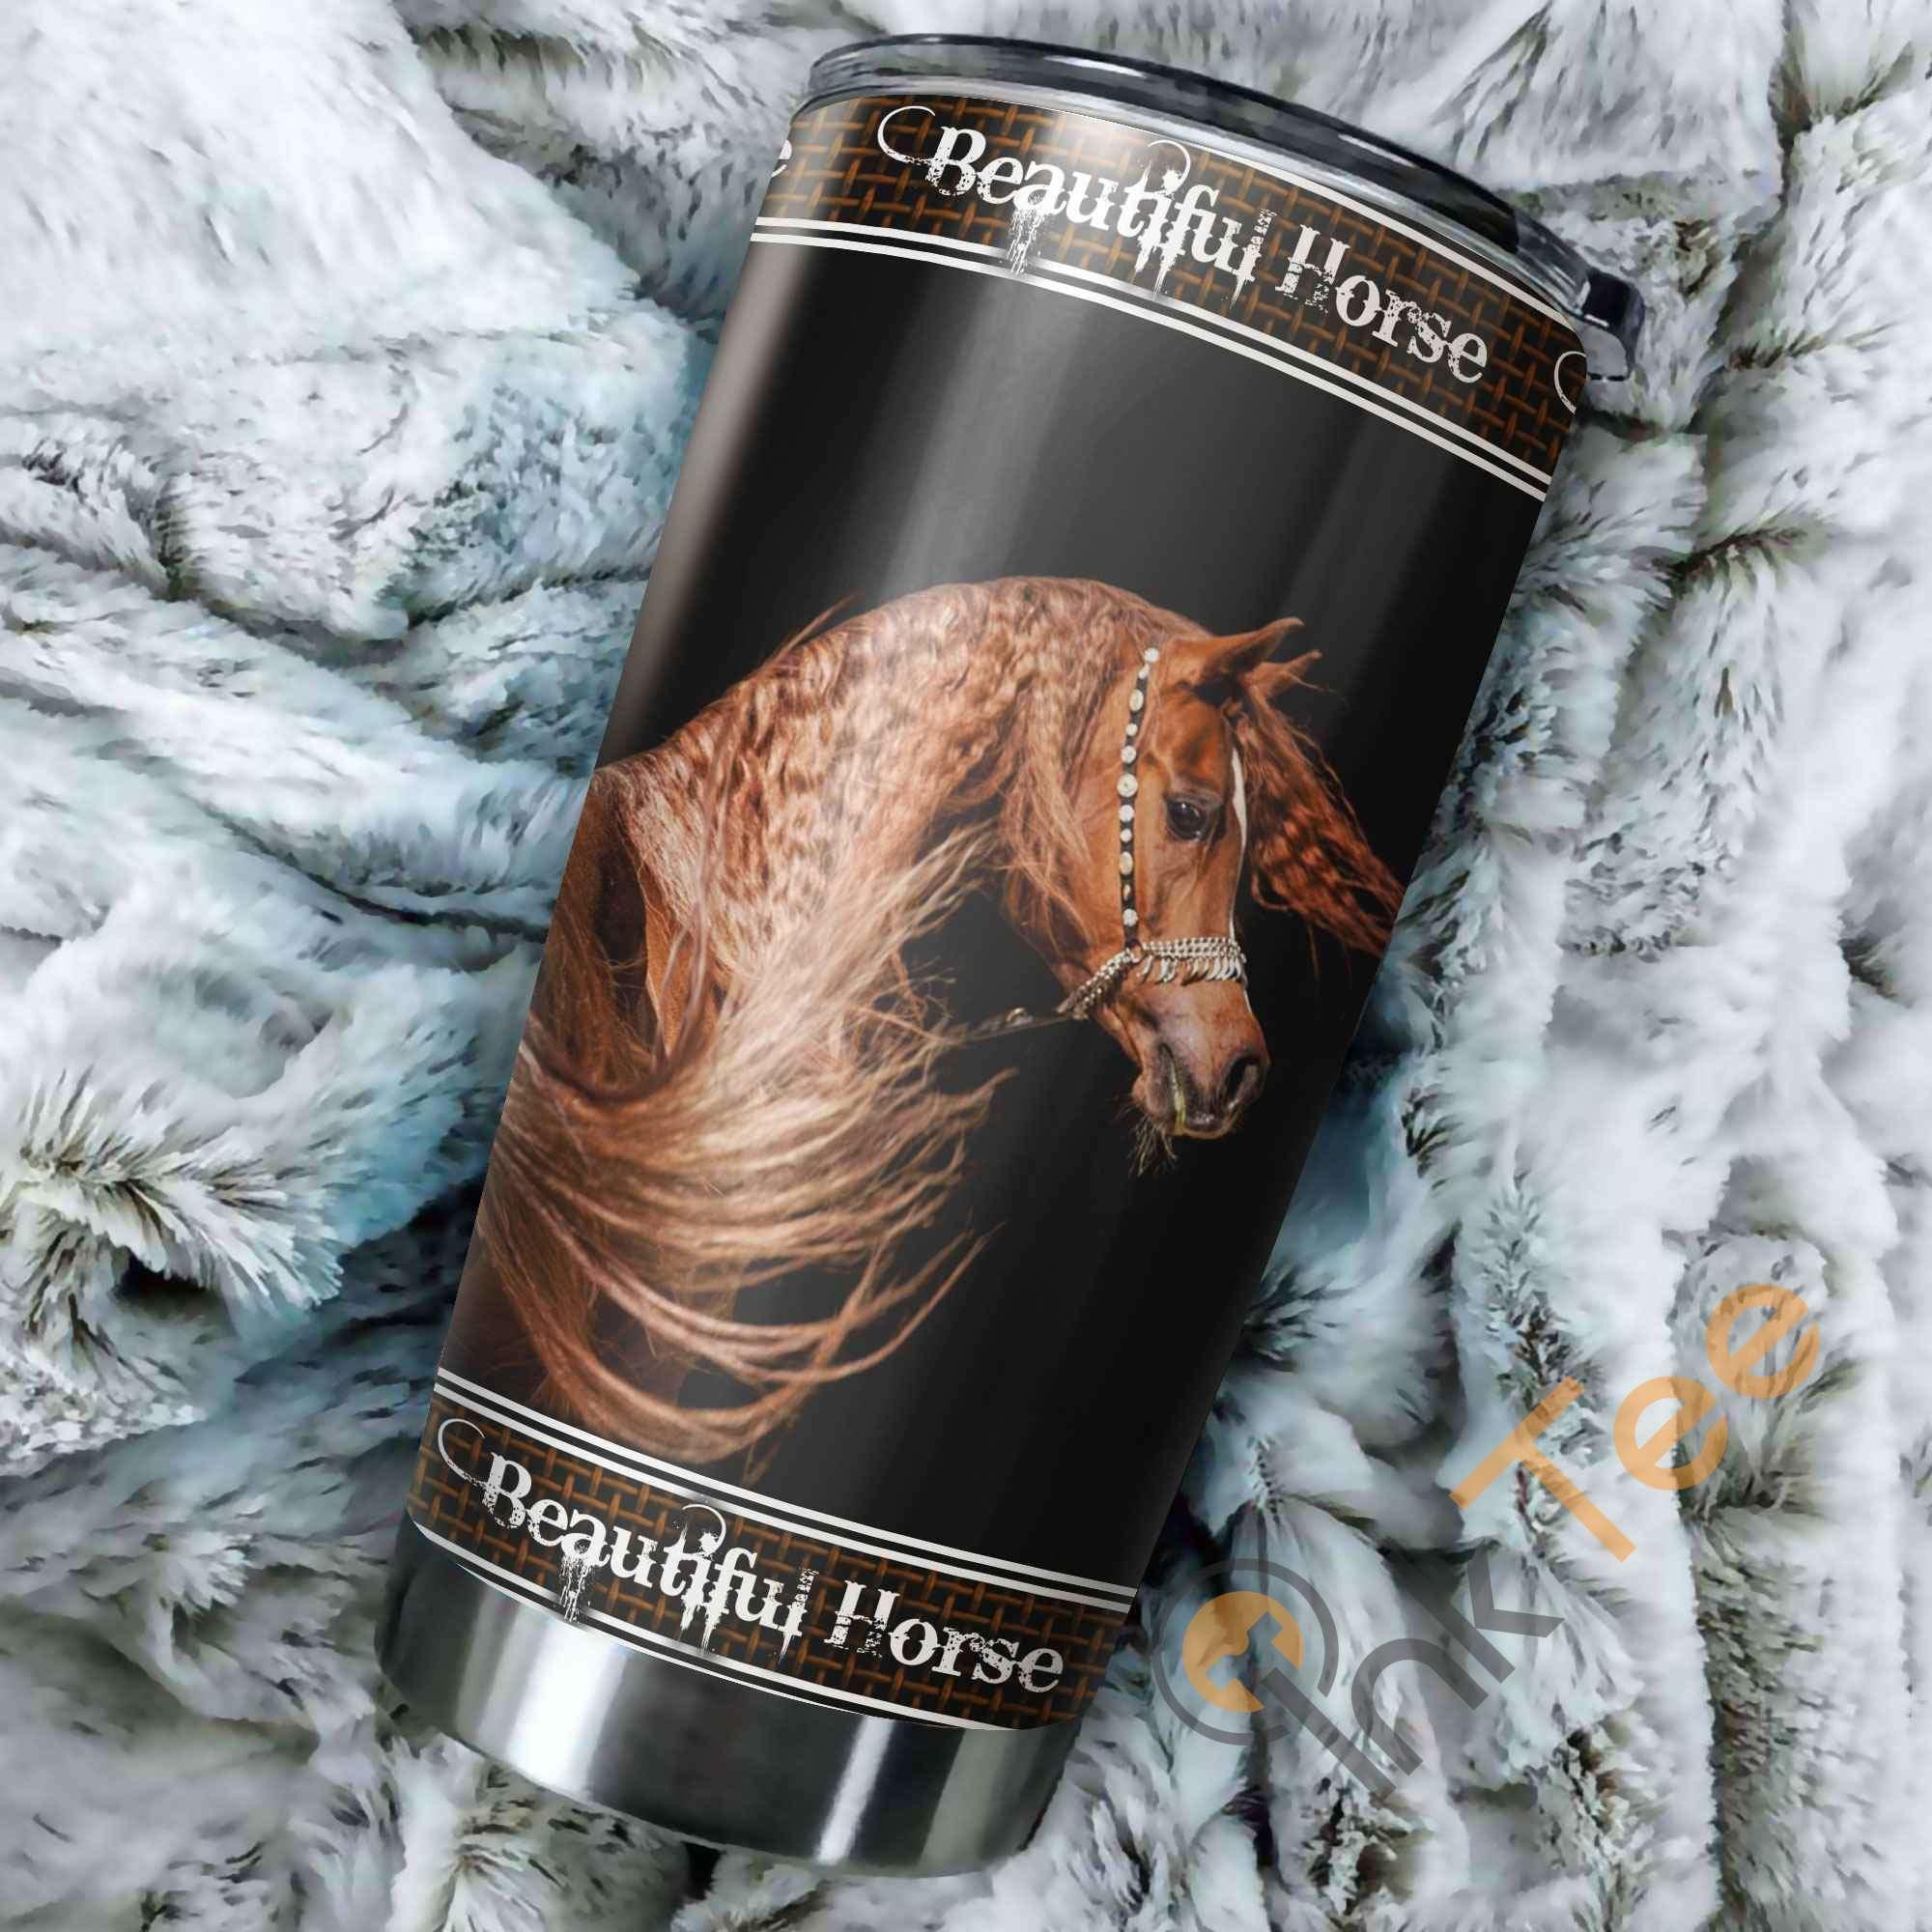 Beautiful Horse Amazon Best Seller Sku 3520 Stainless Steel Tumbler